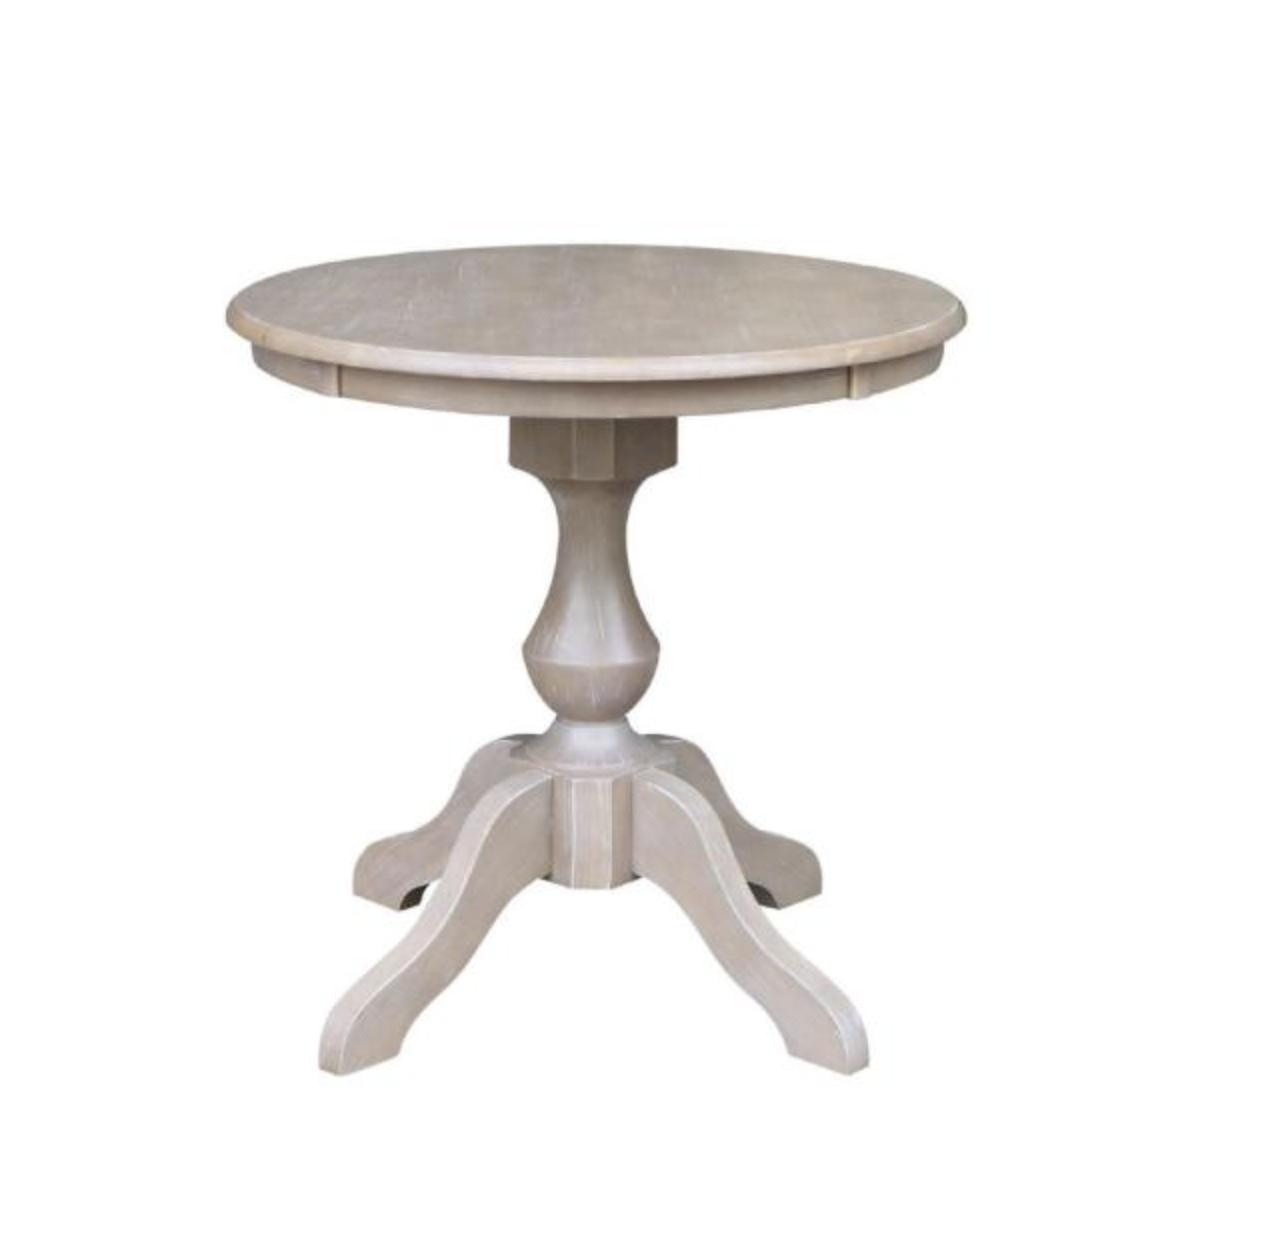 "Eliza 30"" Rd Wood Pedestal Dining Table $65"